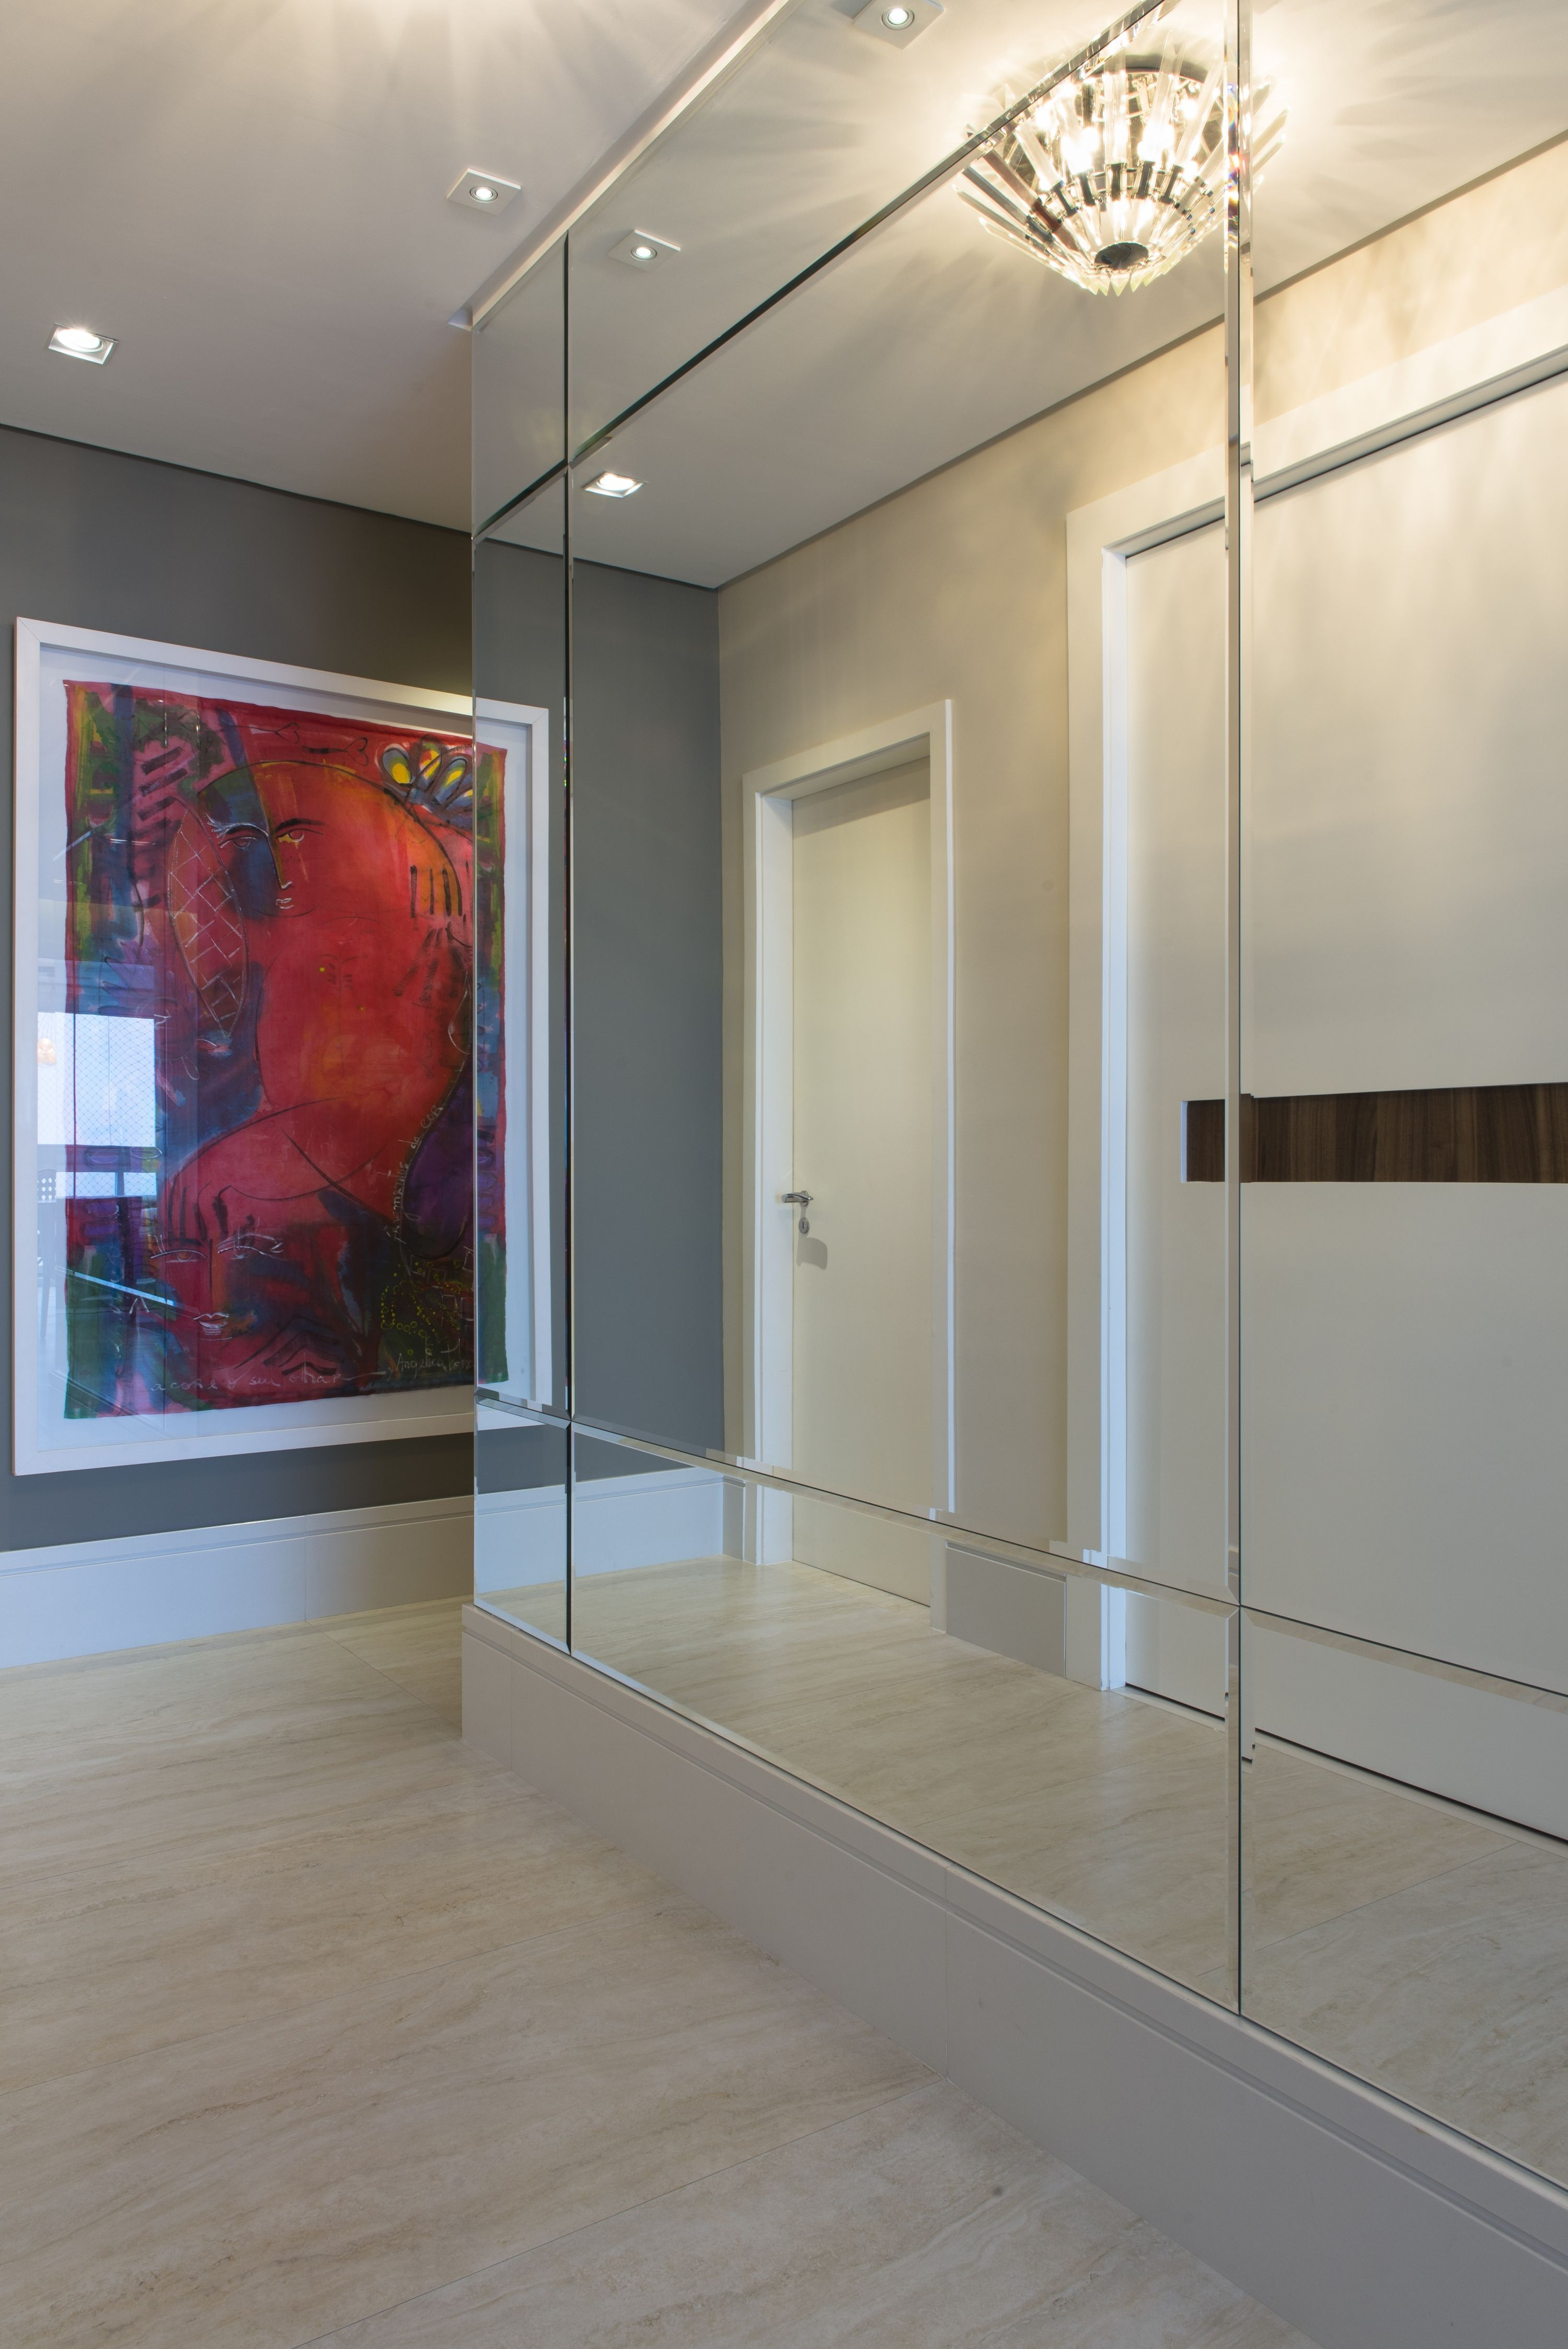 Entrance Hall, Entrance Decor, Mirrors, Arquitetura, Apartments, Shape, Home Entrance